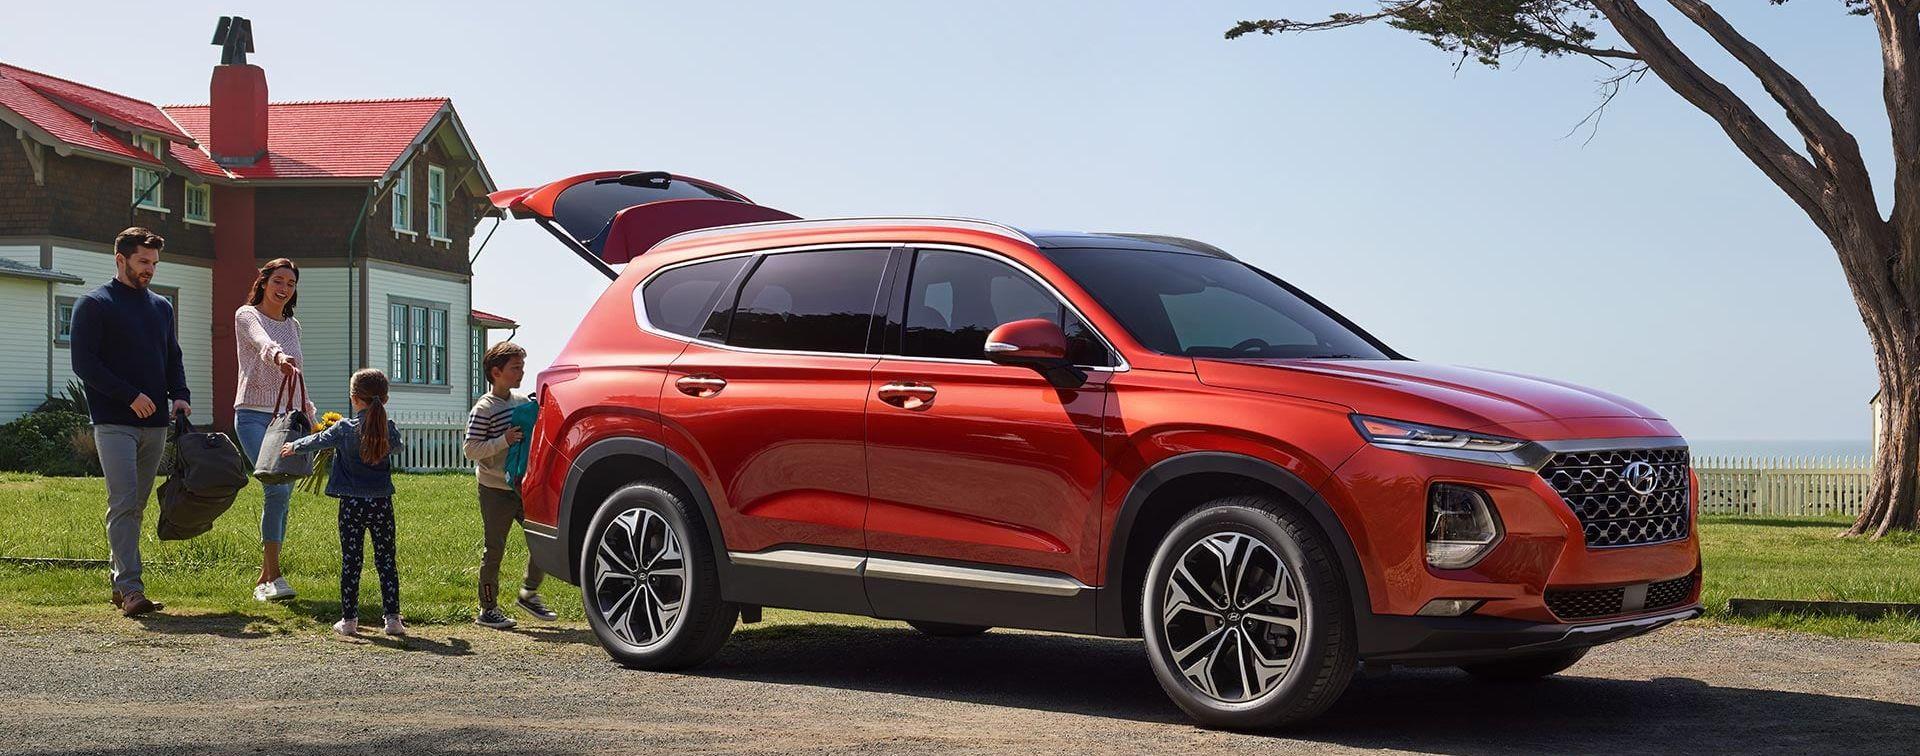 Hyundai Santa Fe 2019 a la venta cerca de Manassas, VA